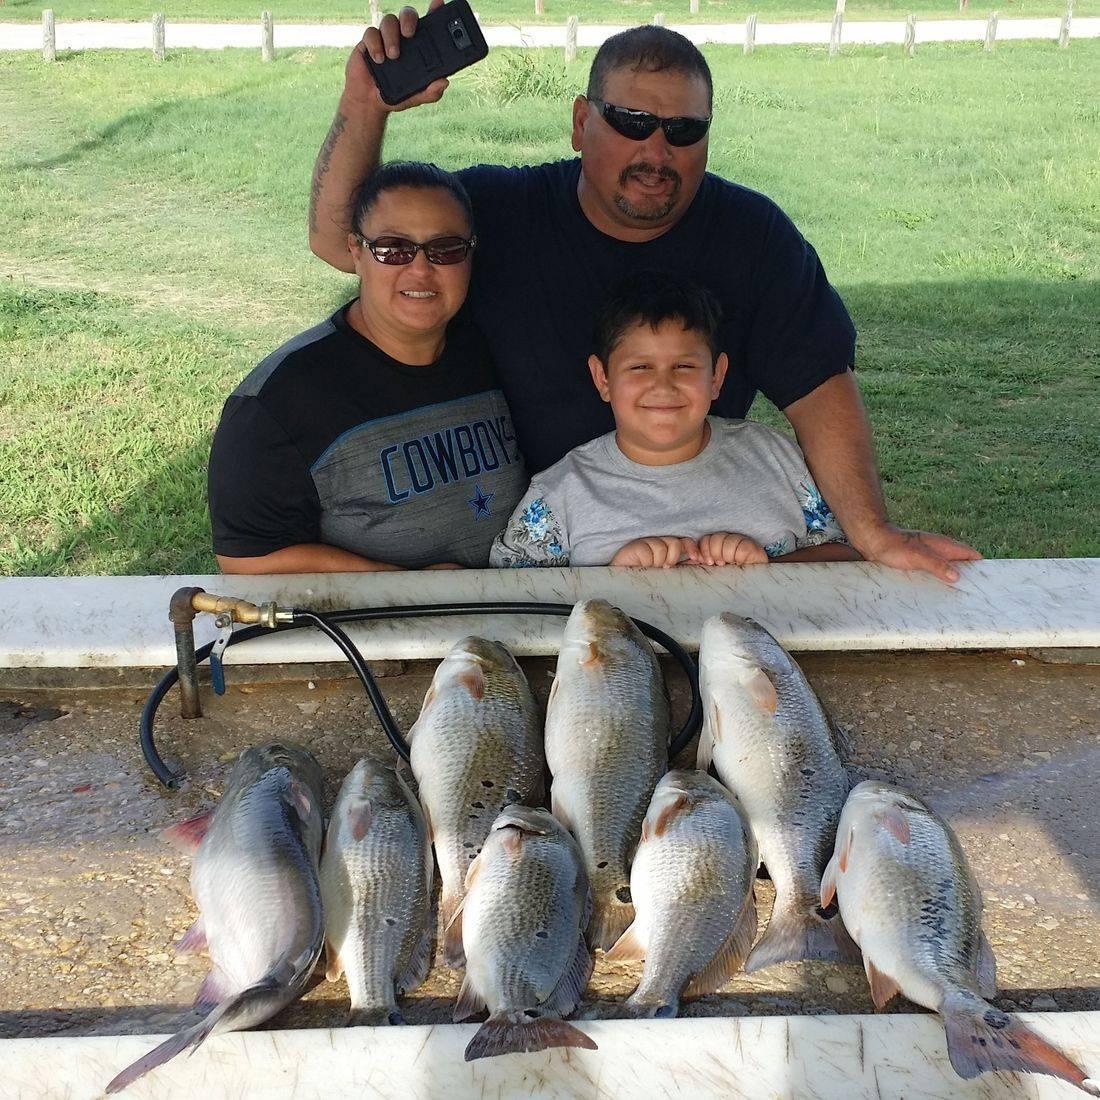 Calaveras Lake & Braunig Lake, Fishing Trips, Guide Service, San Antonio Texas